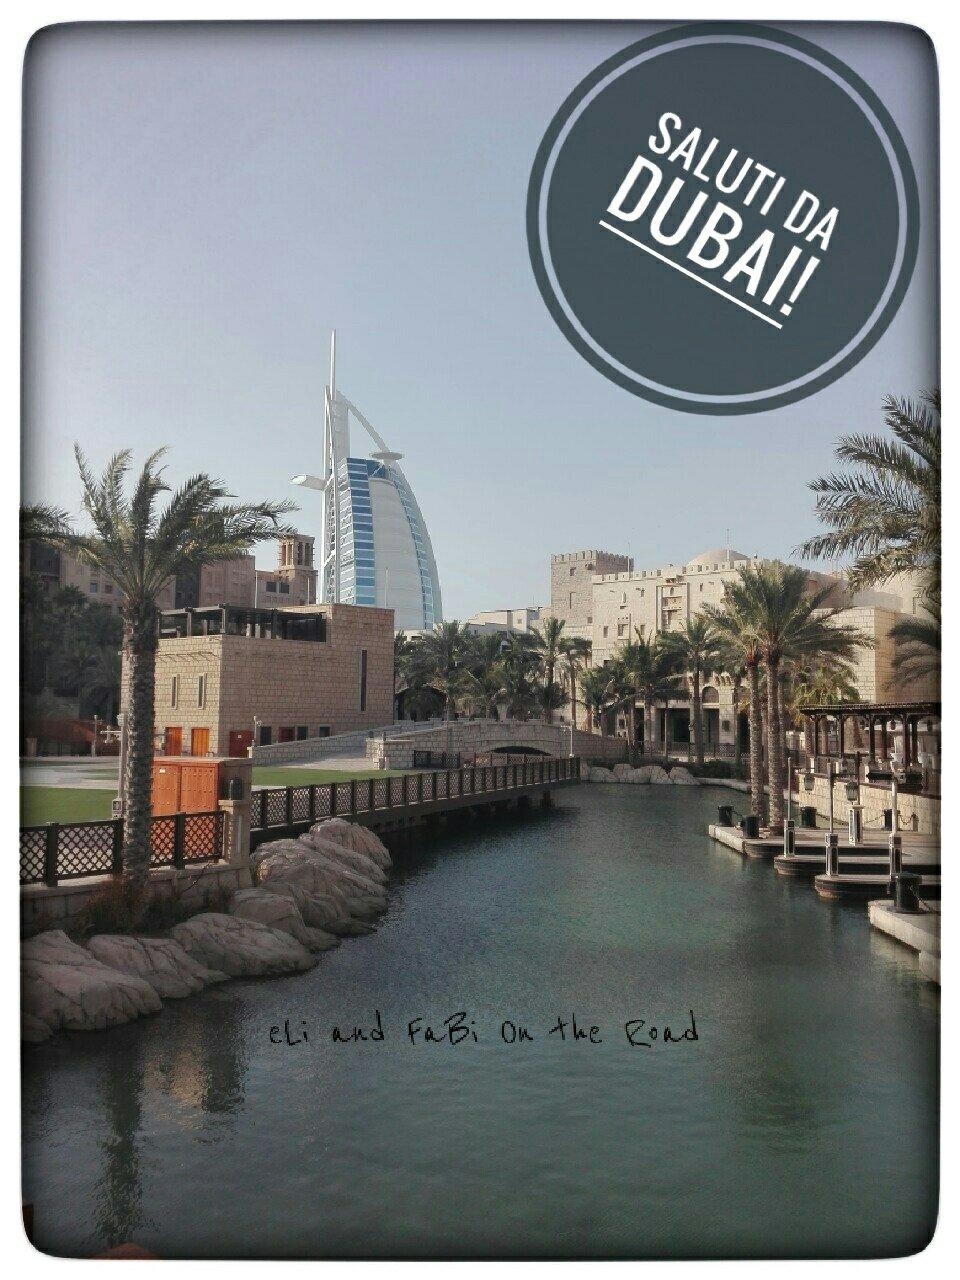 #CartolineDalMondo: Saluti da Dubai!